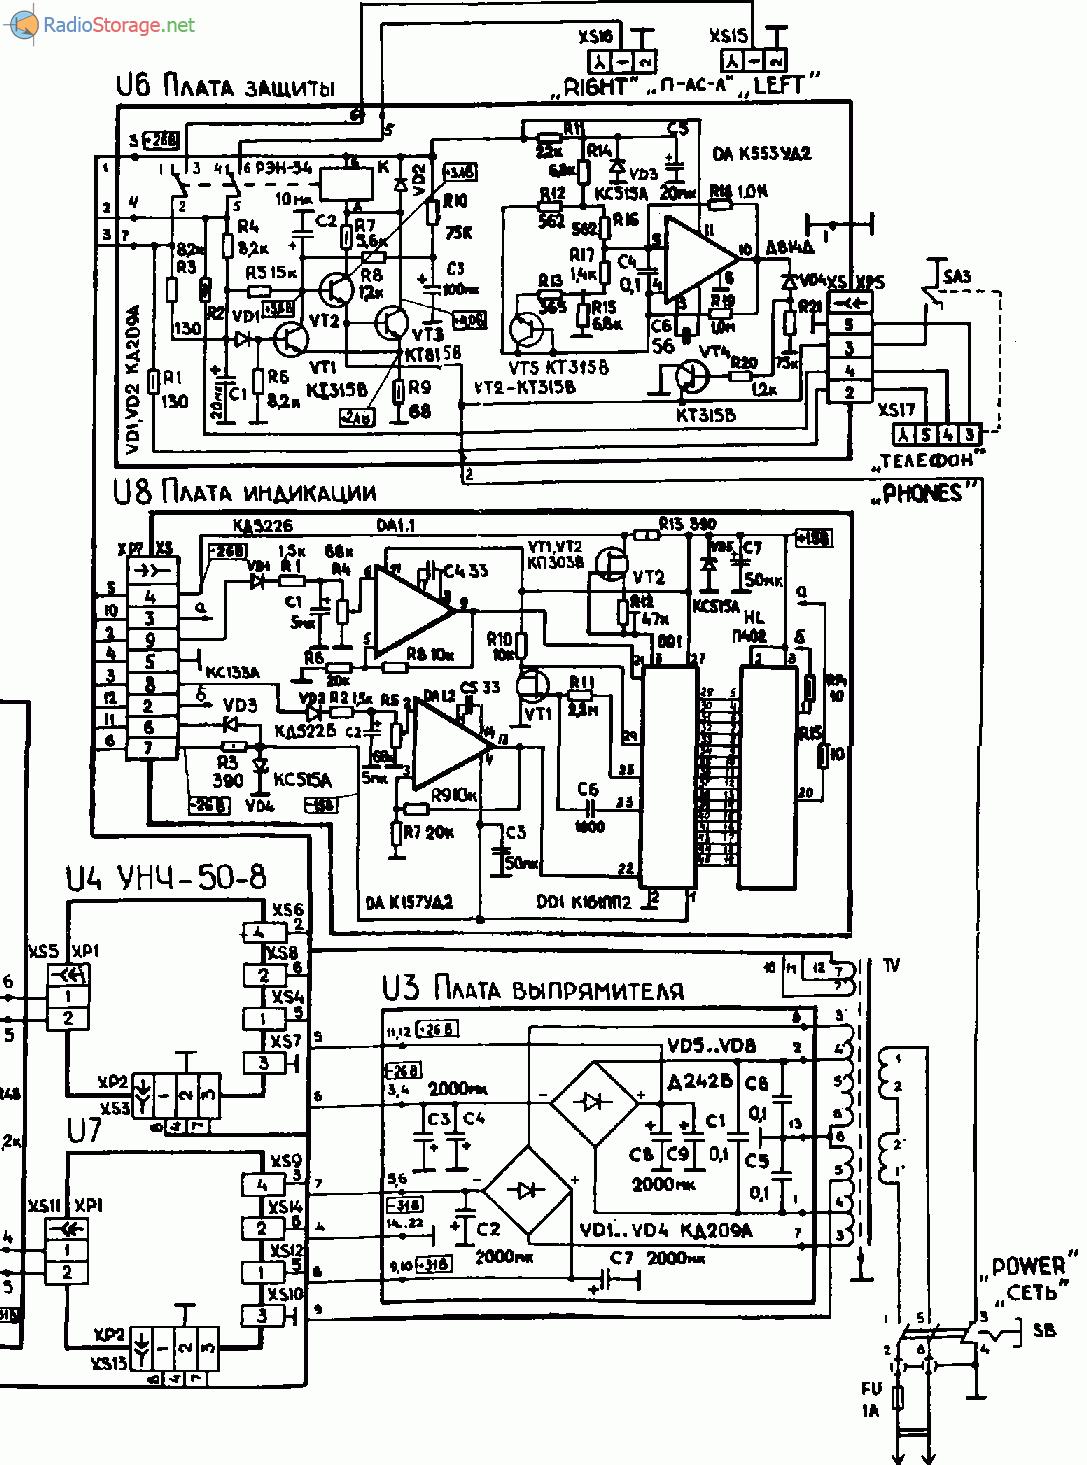 Ремонт усилителя radiotehnika у-101 стерео яплакалъ.